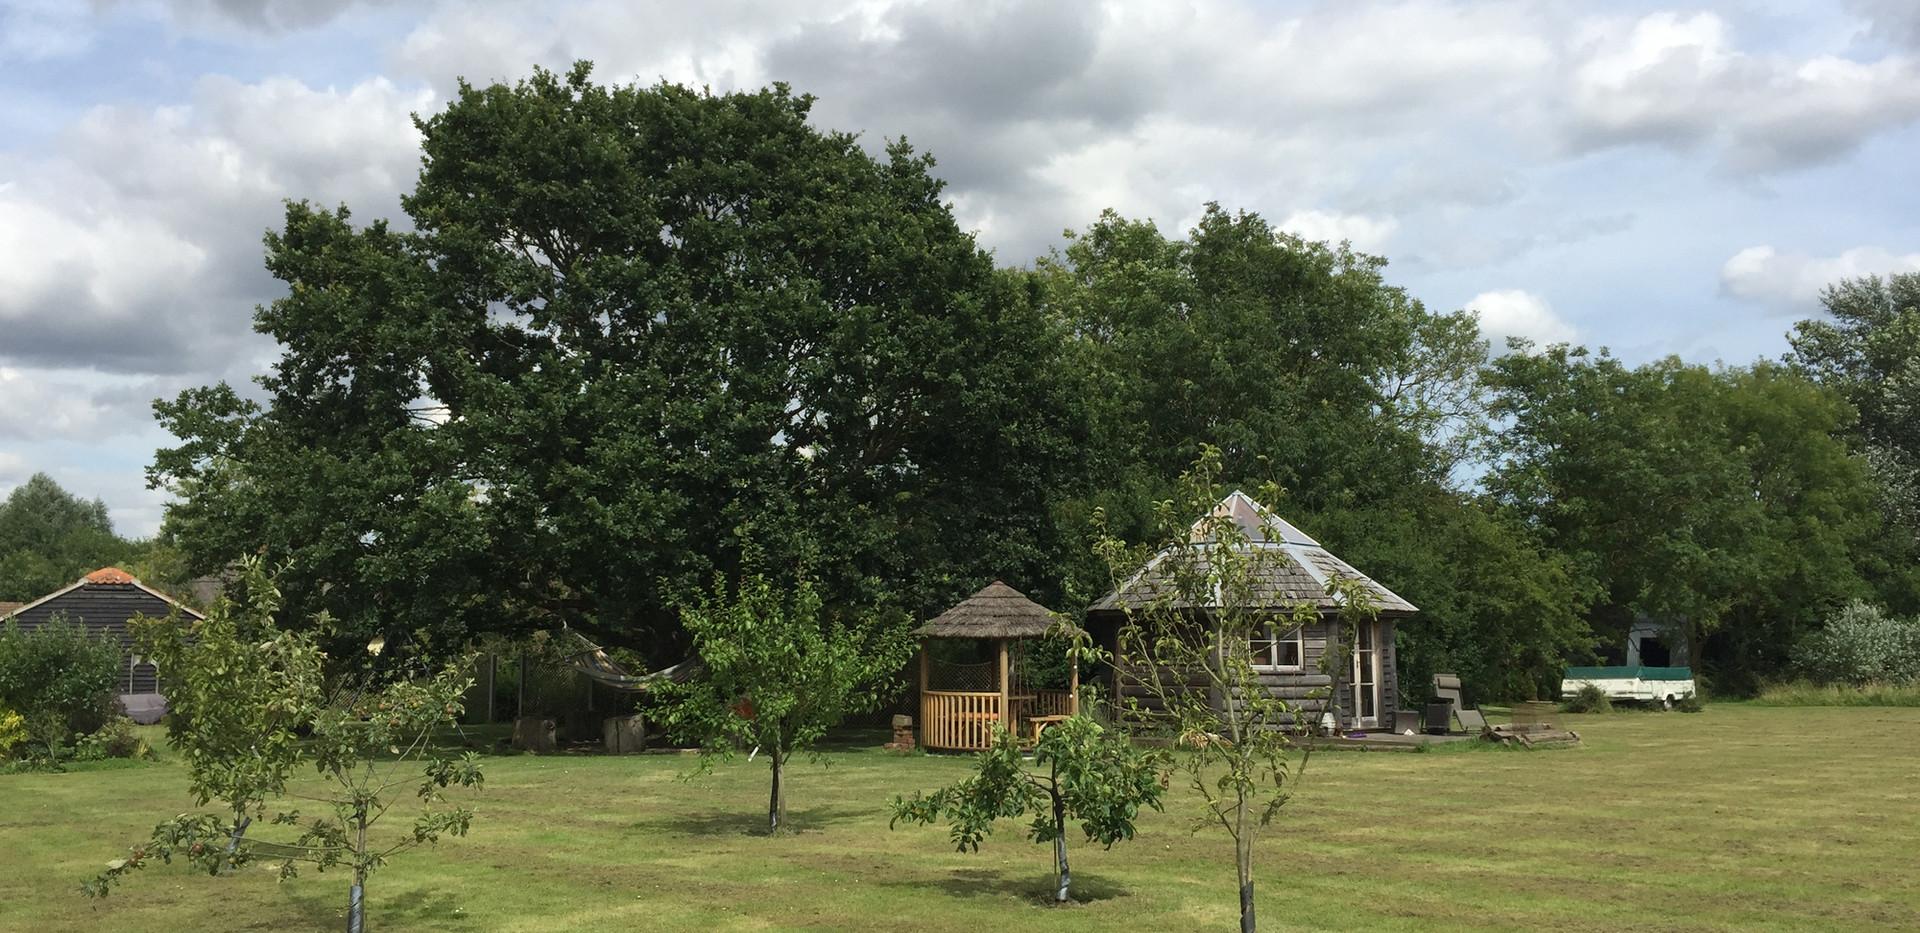 Farm View Studios